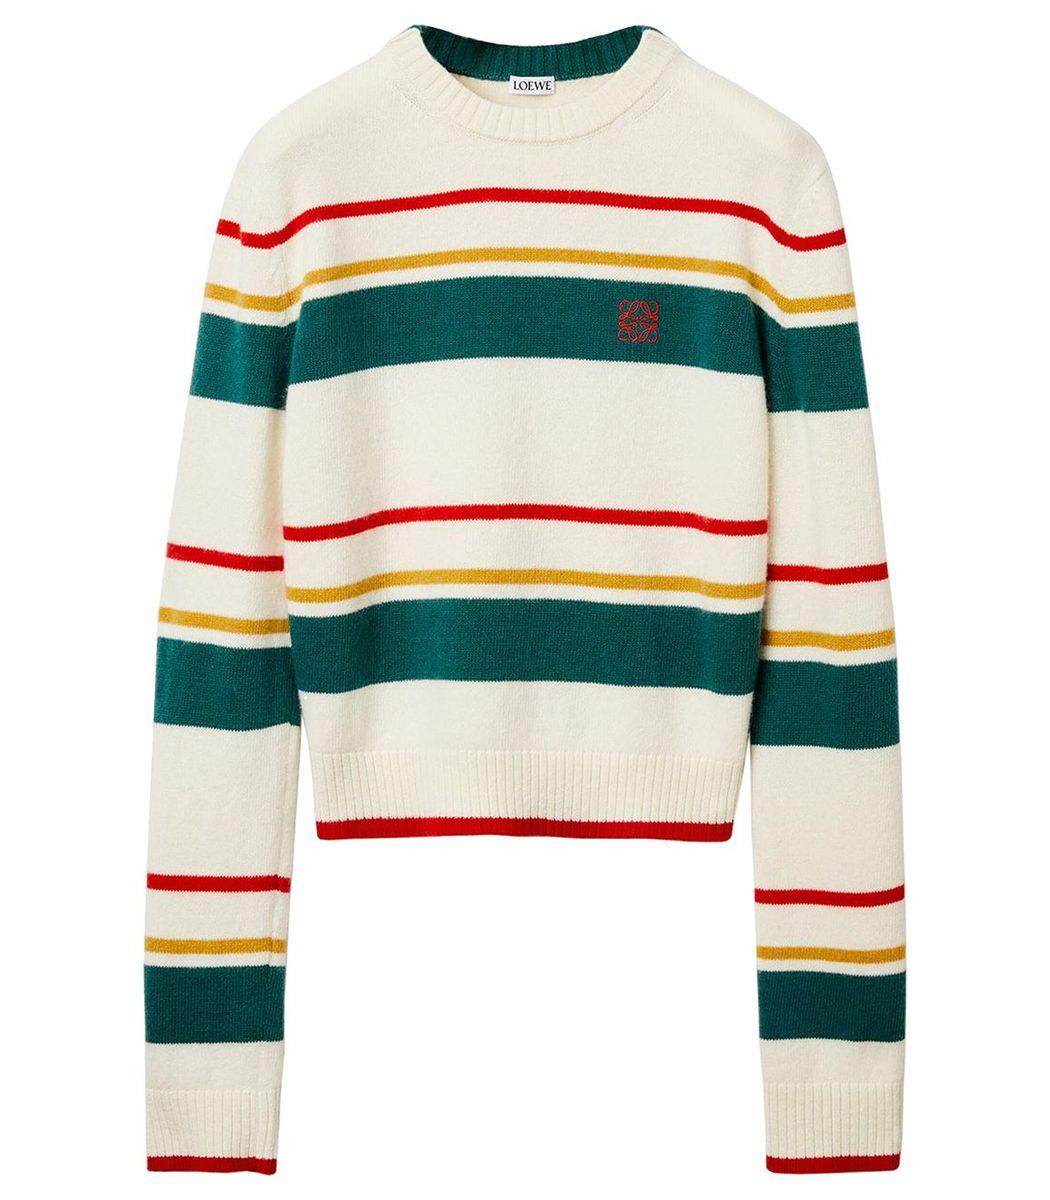 Loewe Stripe Anagram Cropped Sweater